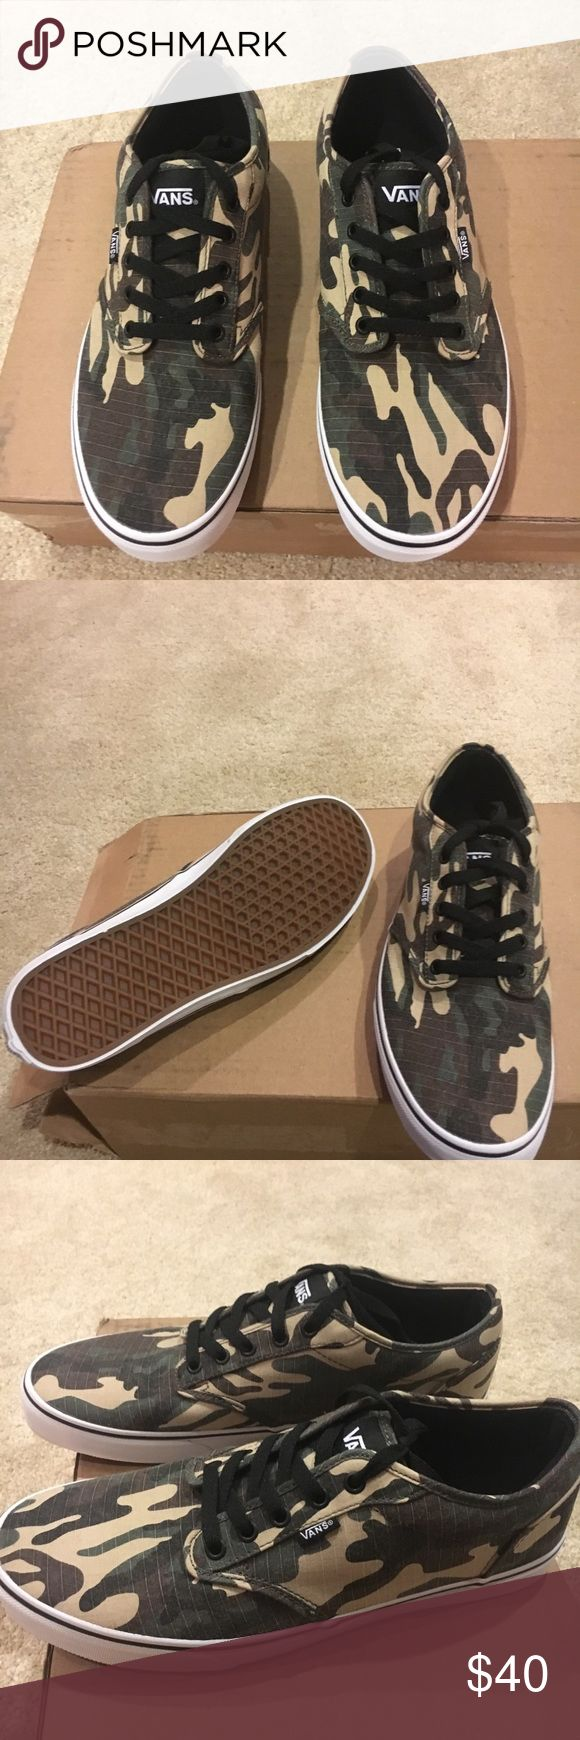 Vans Camo skate Vans Camo skate Men's size 11.5 White/Camo  Brand new/box Vans Shoes Sneakers